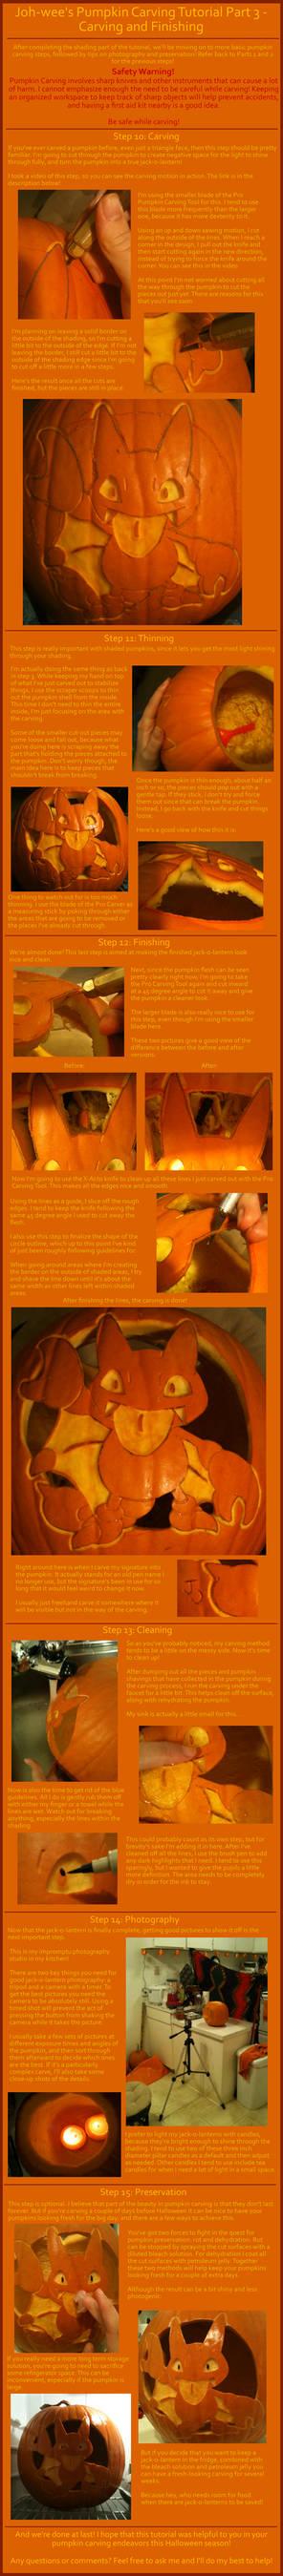 Pumpkin Carving Tutorial - Part 3